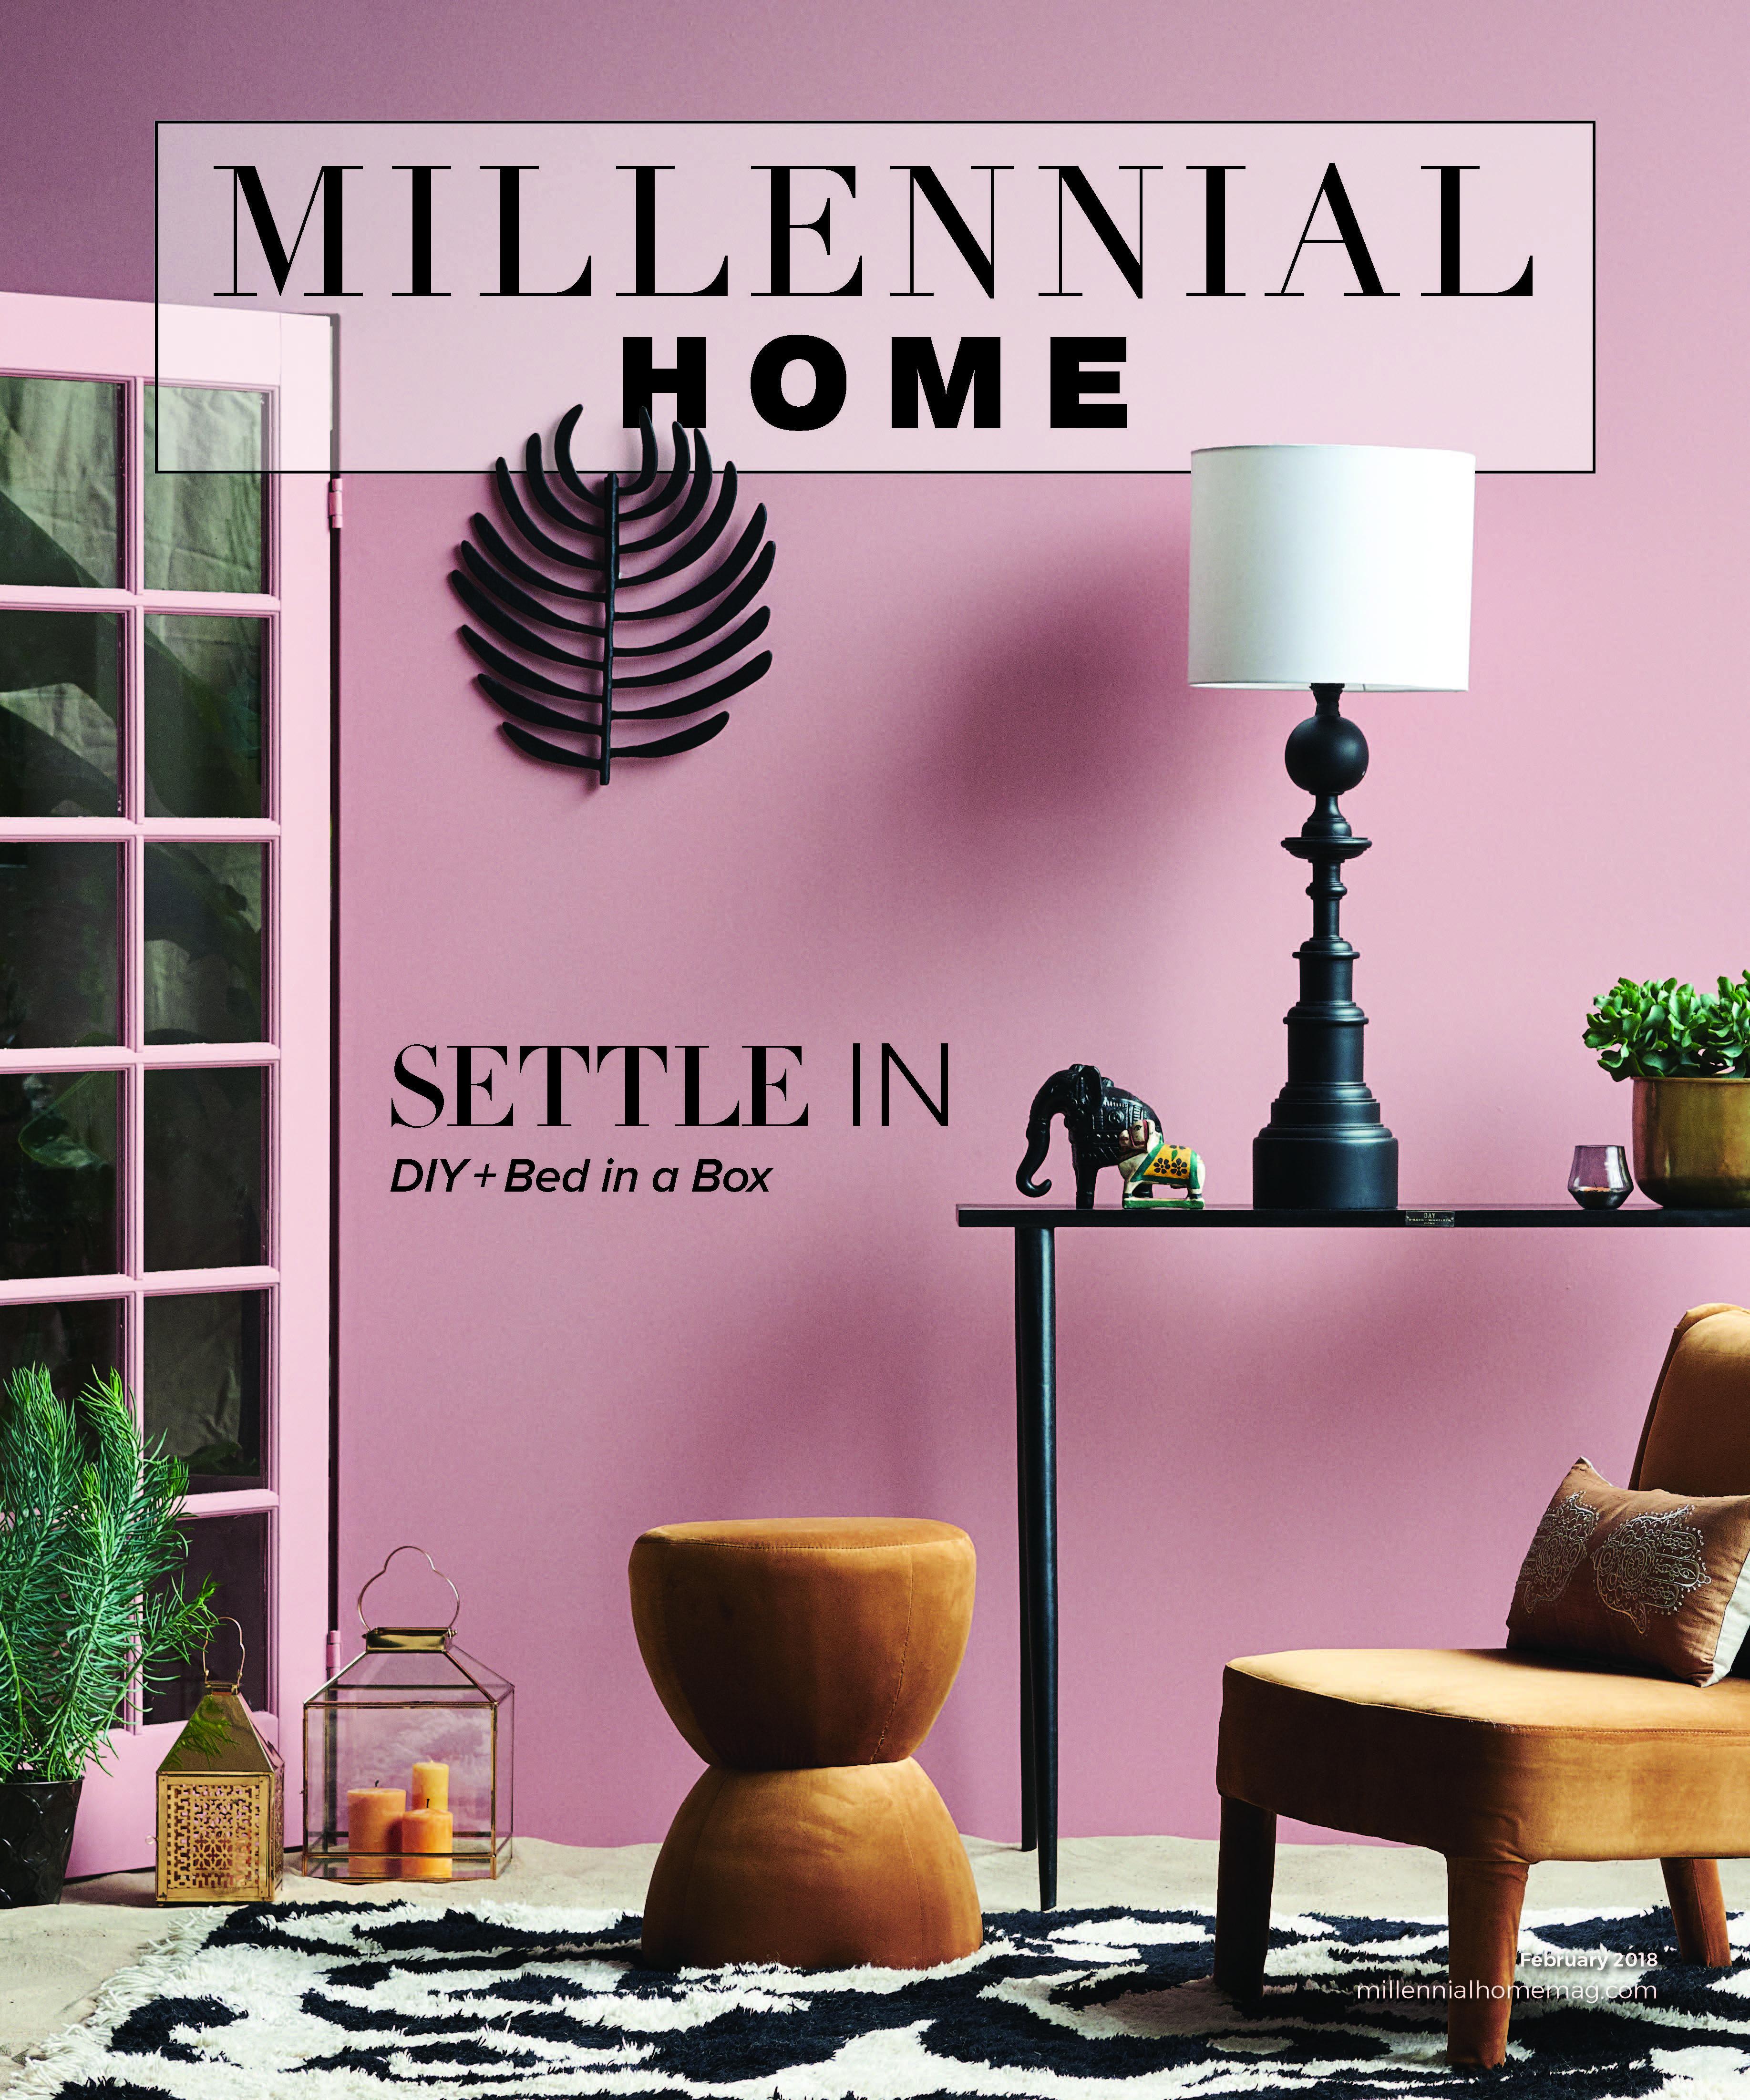 Millennial Home February 2018 pink